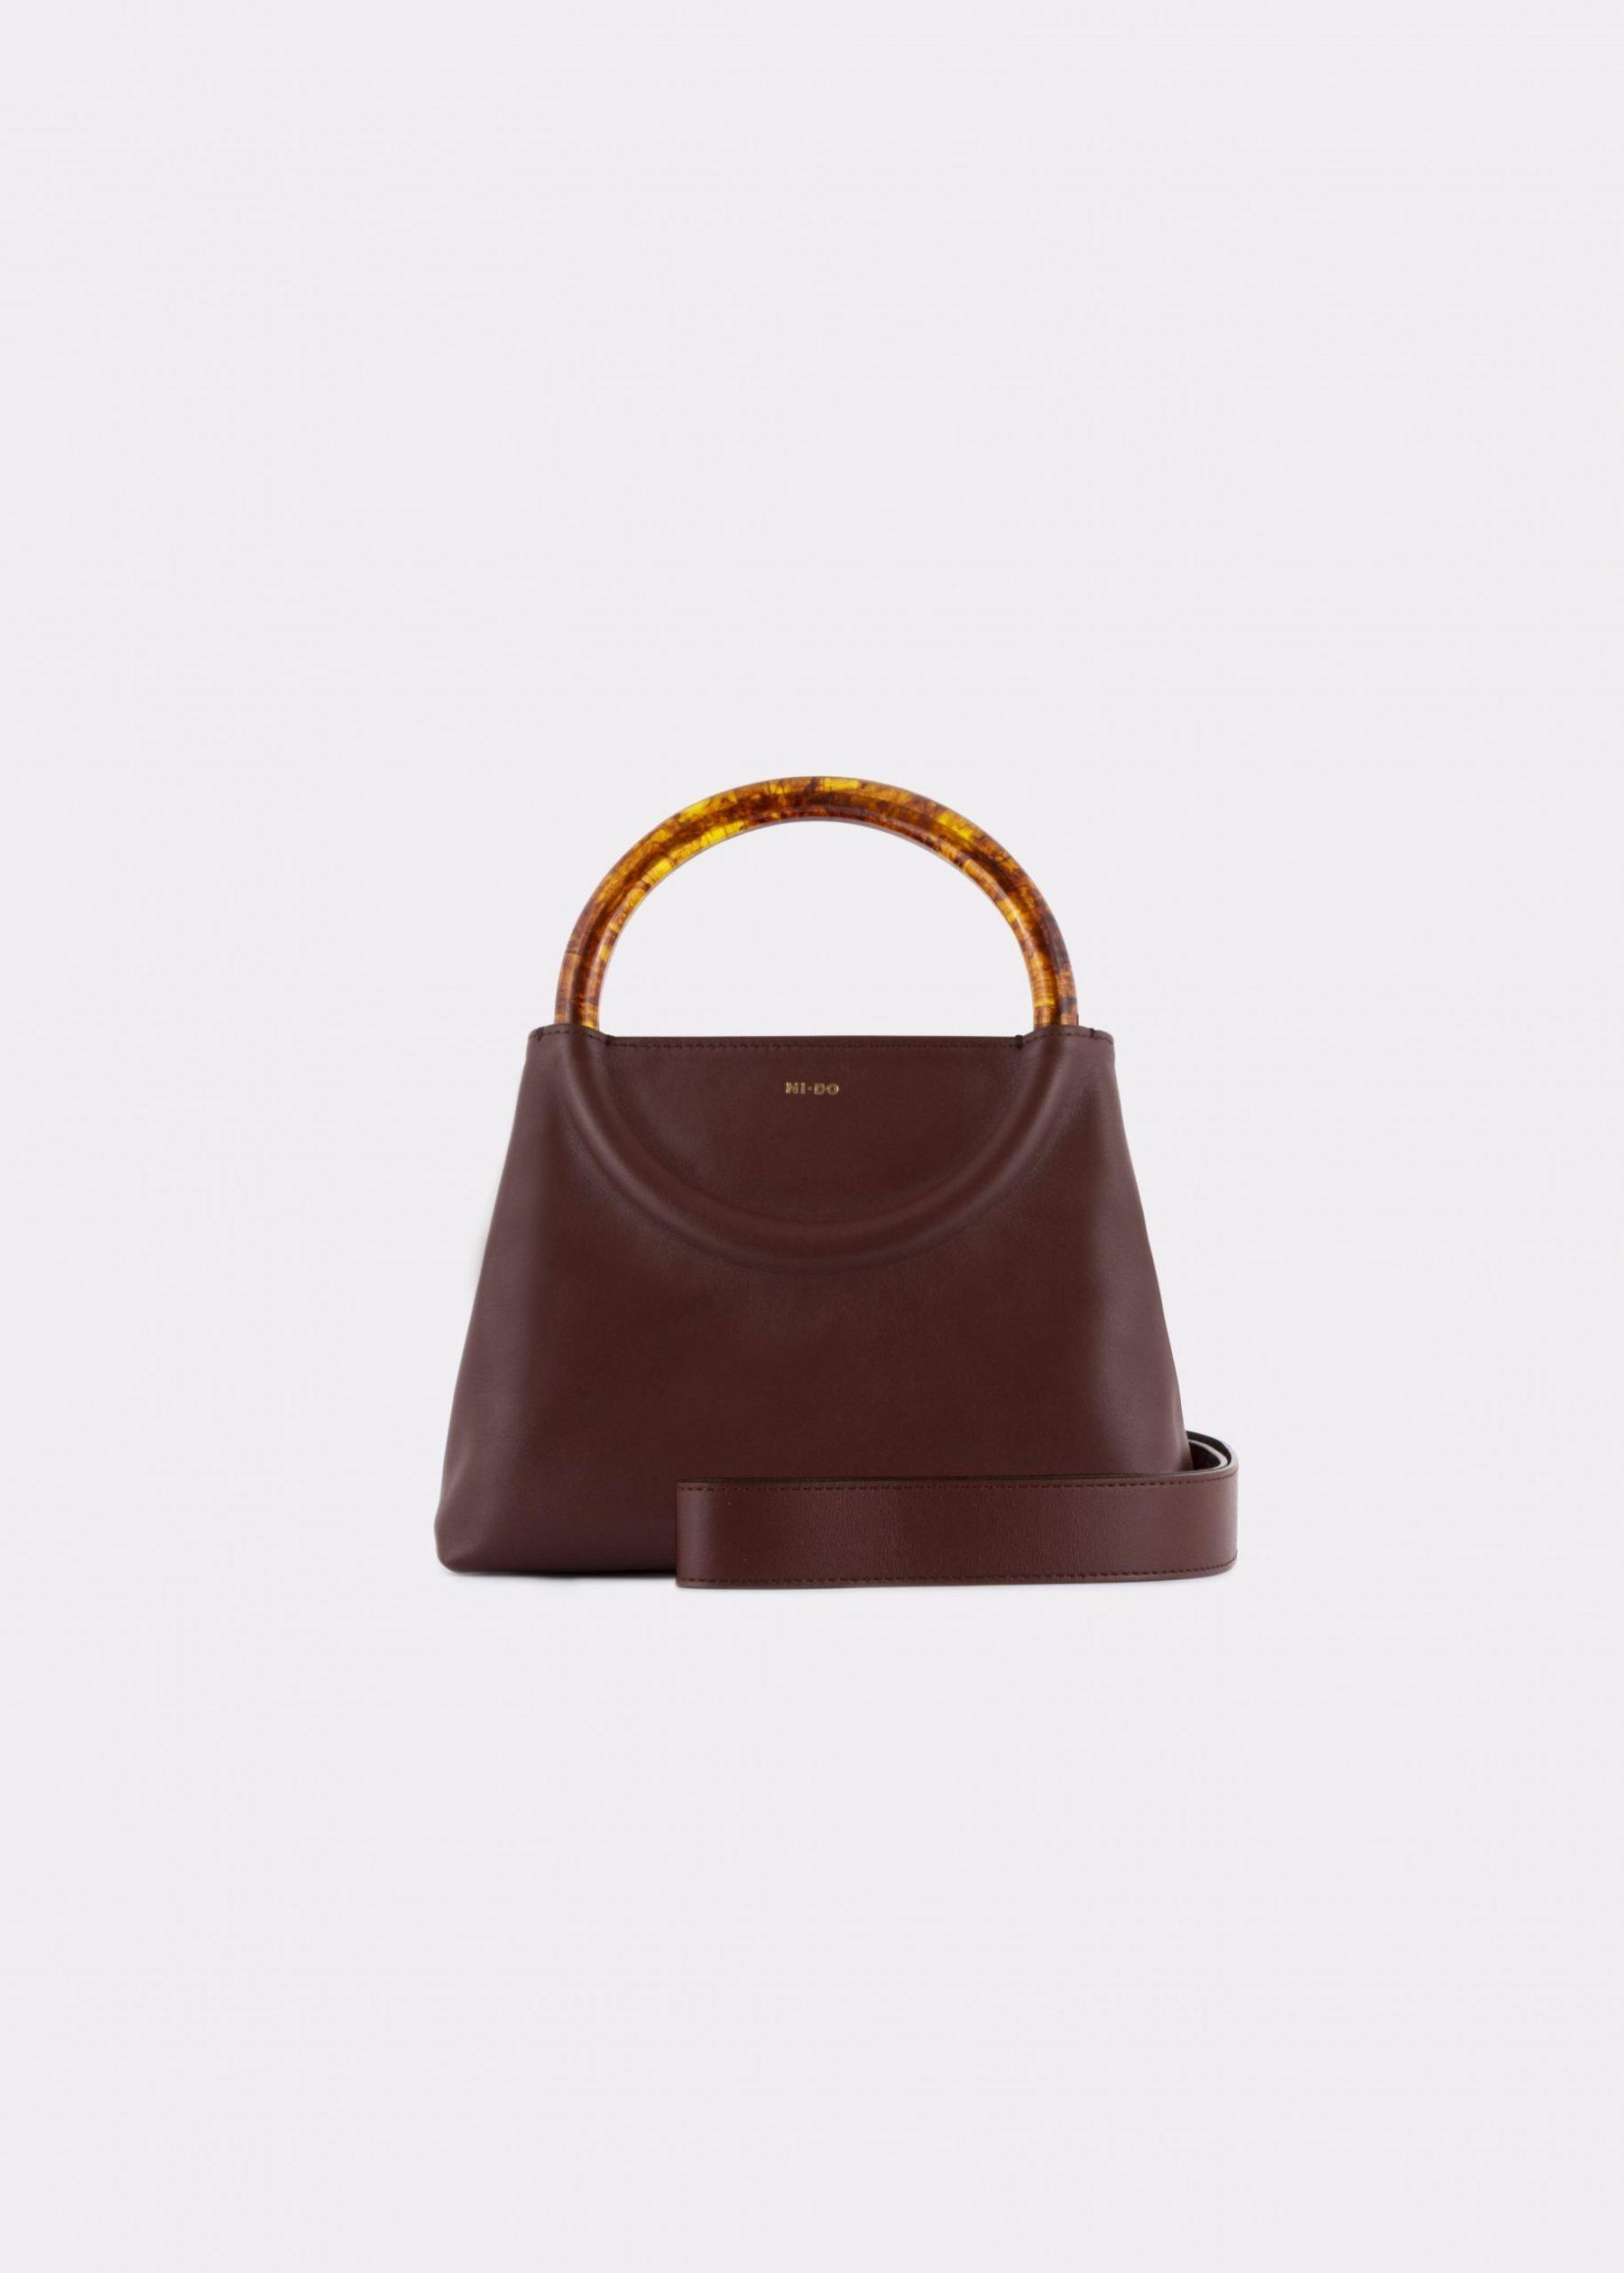 NIDO Bolla Mini Chestnut/Amber_ shoulder strap view